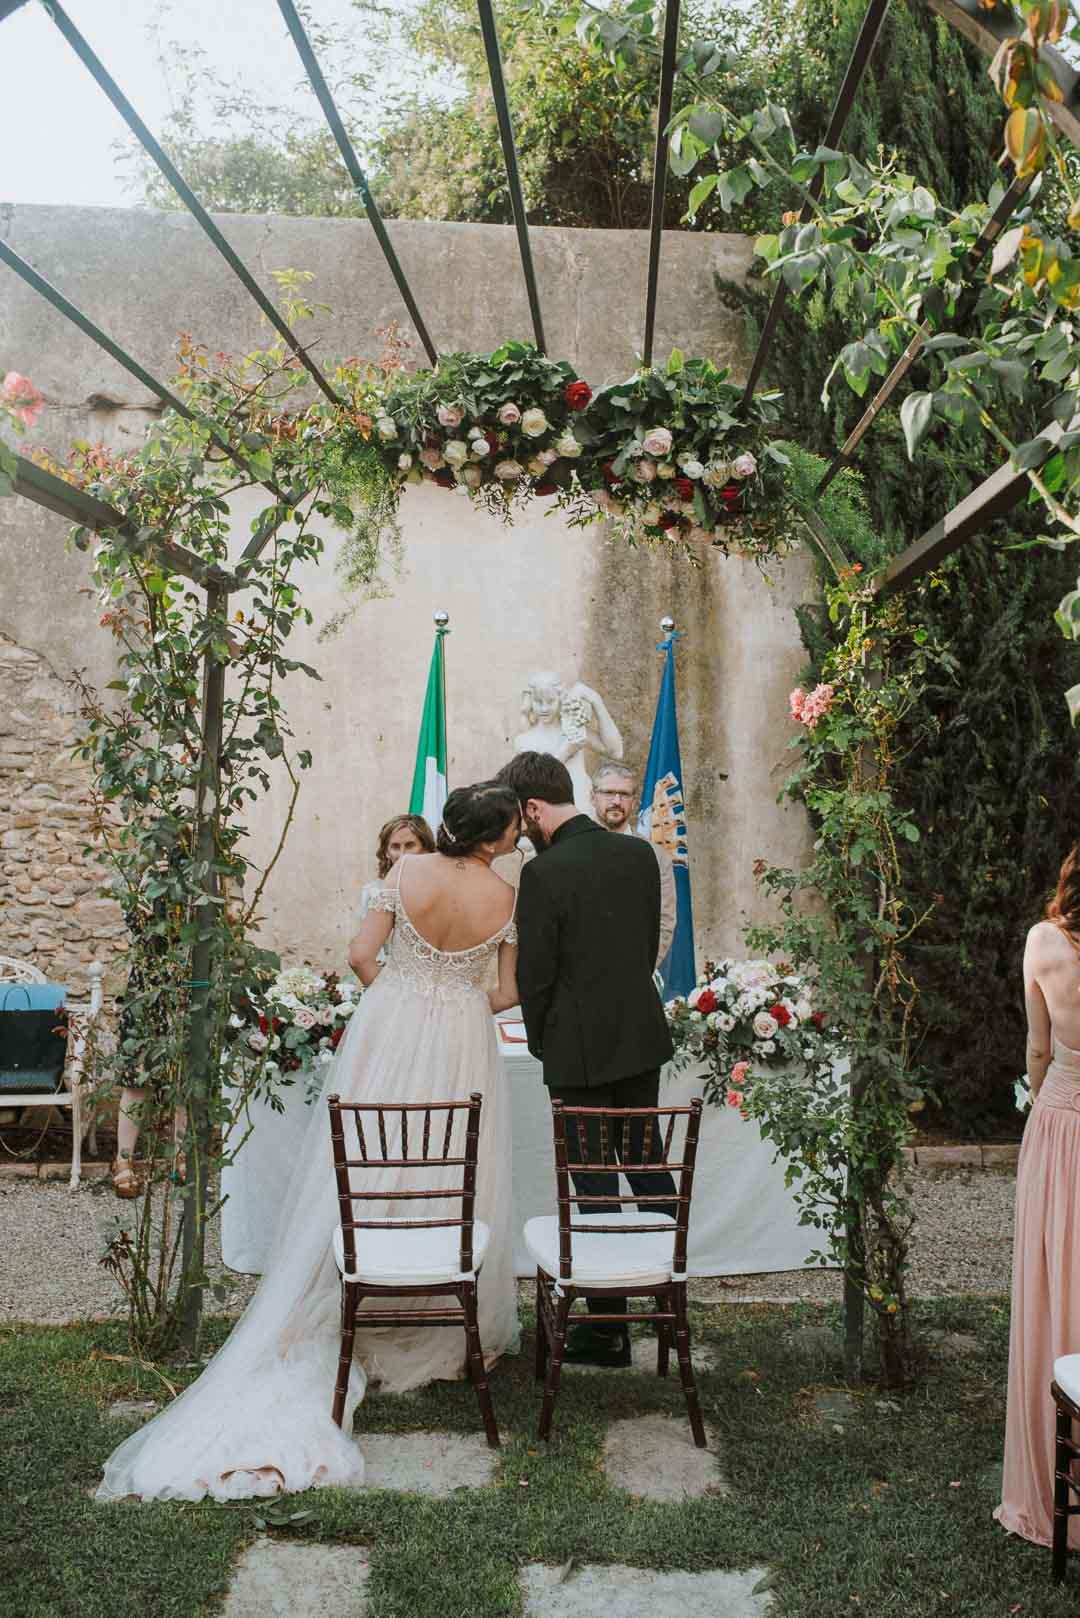 wedding-photographer-destination-fineart-bespoke-reportage-tuscany-villascorzi-vivianeizzo-spazio46-69